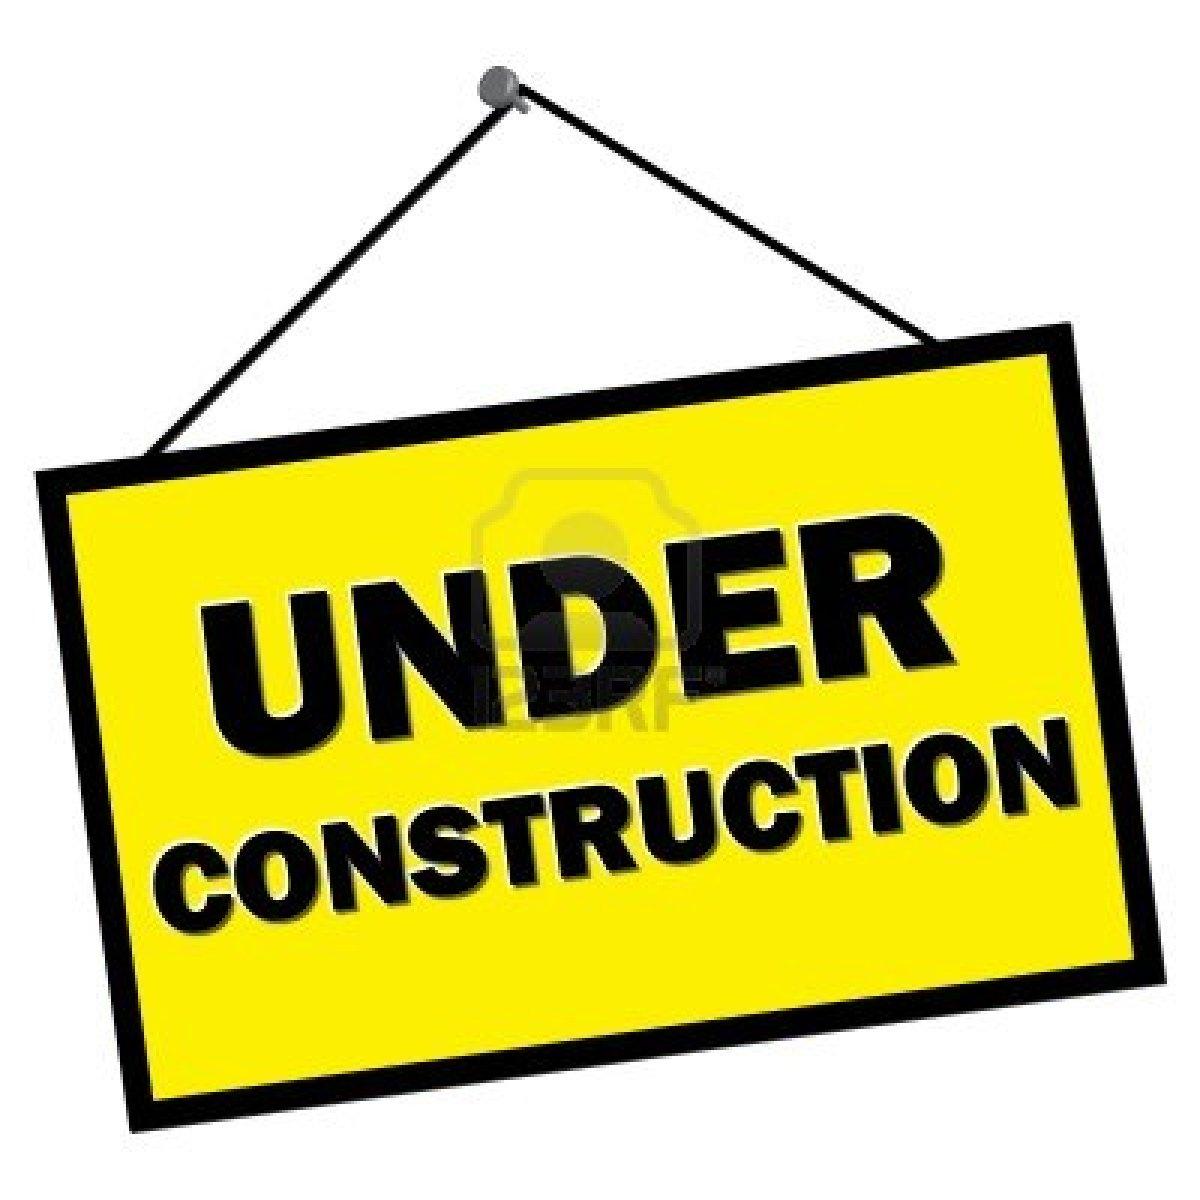 Free clipart under construction sign. Website image download best